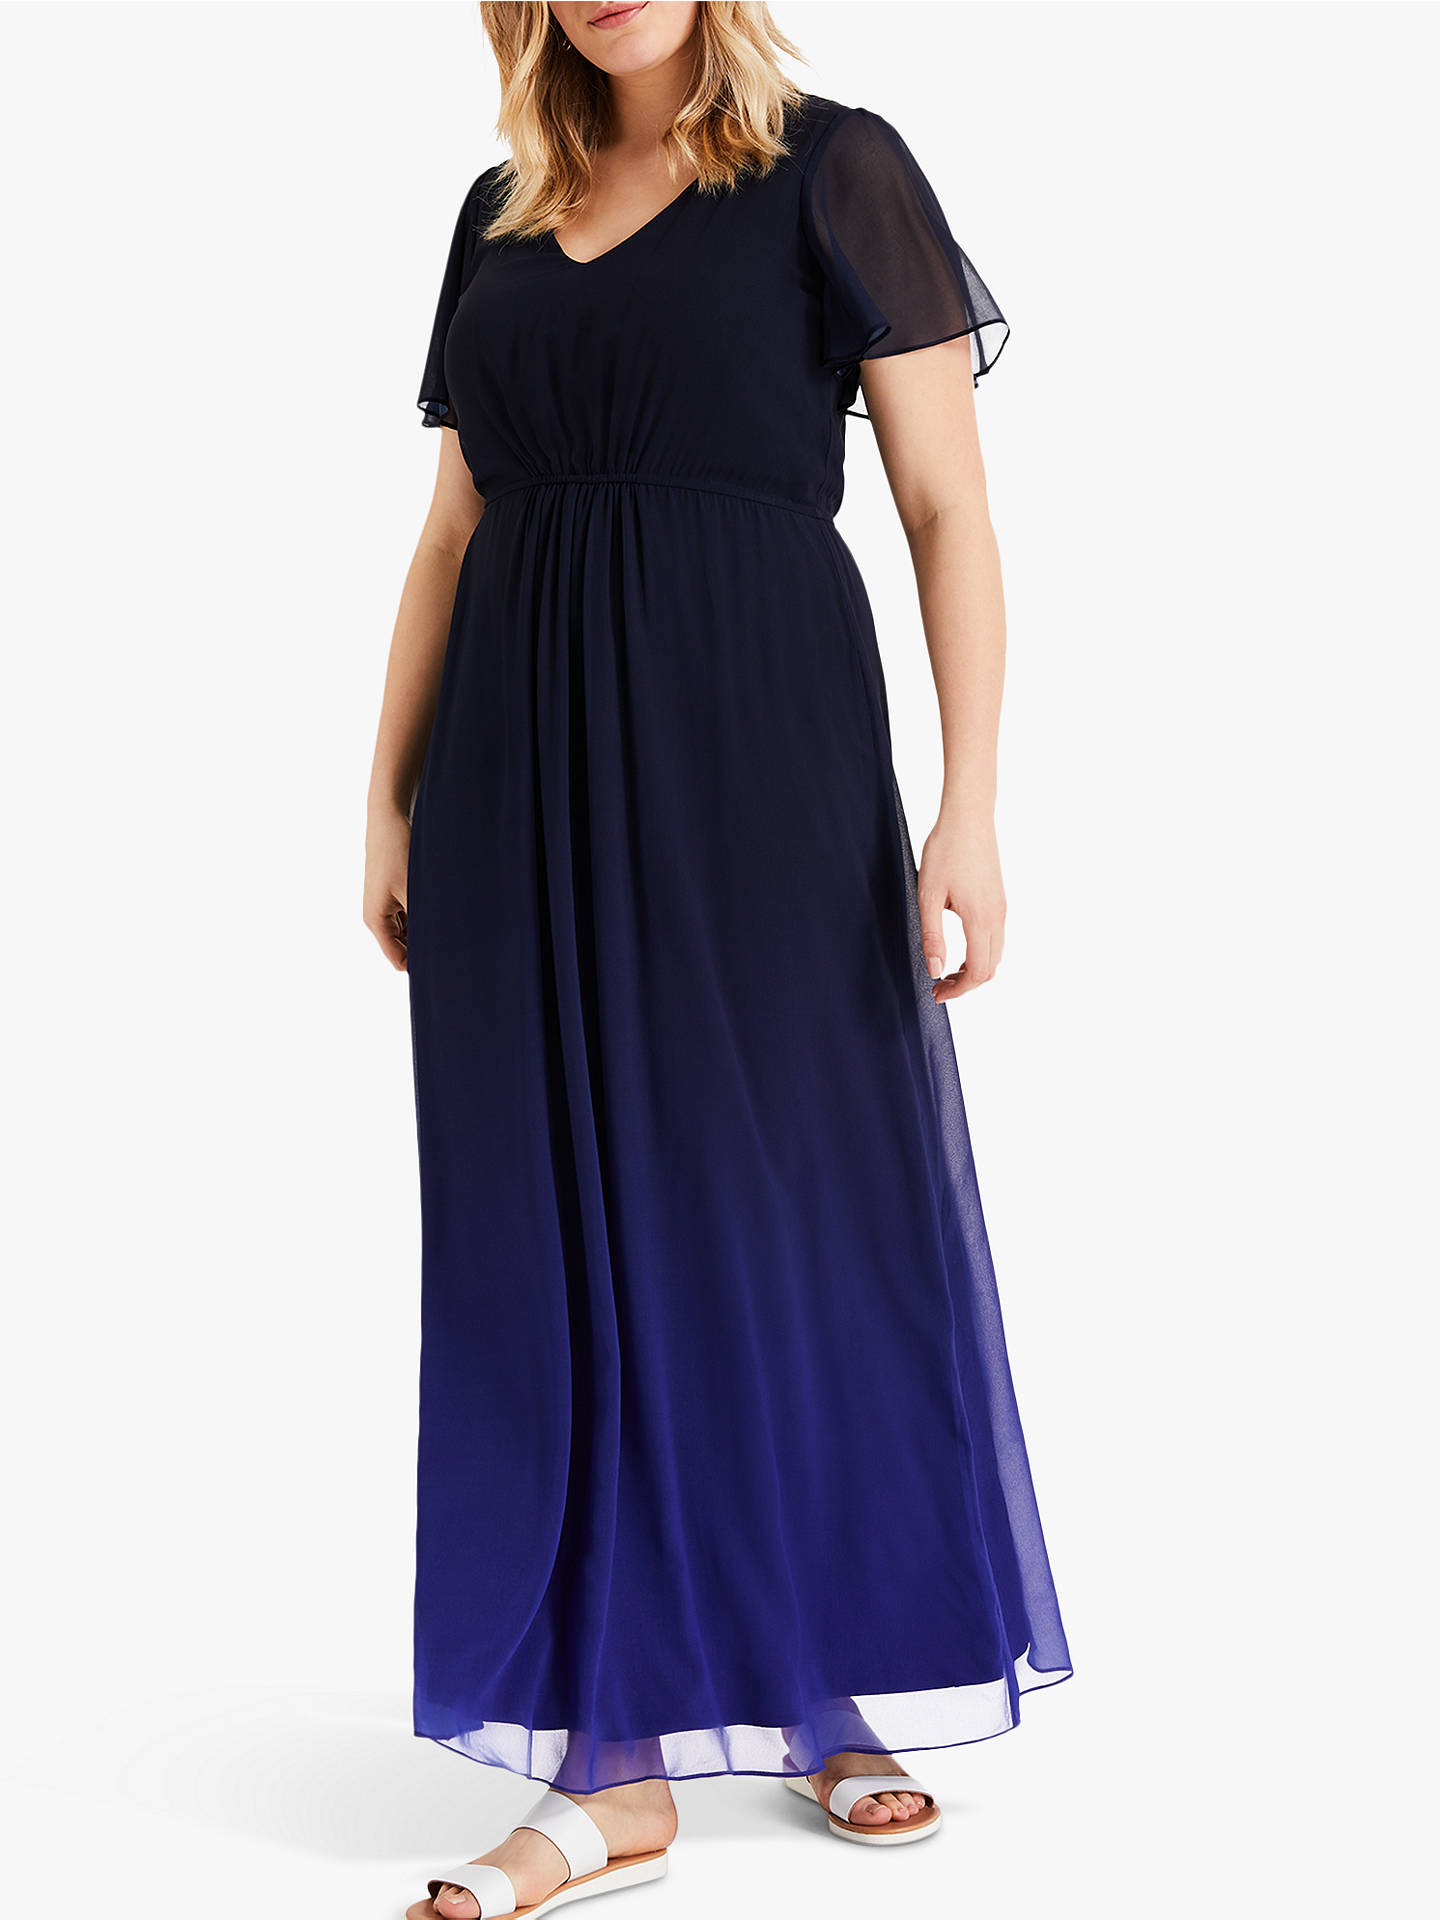 6a75088cd2 Studio 8 Betty Ombre Maxi Dress, Navy/Cobalt